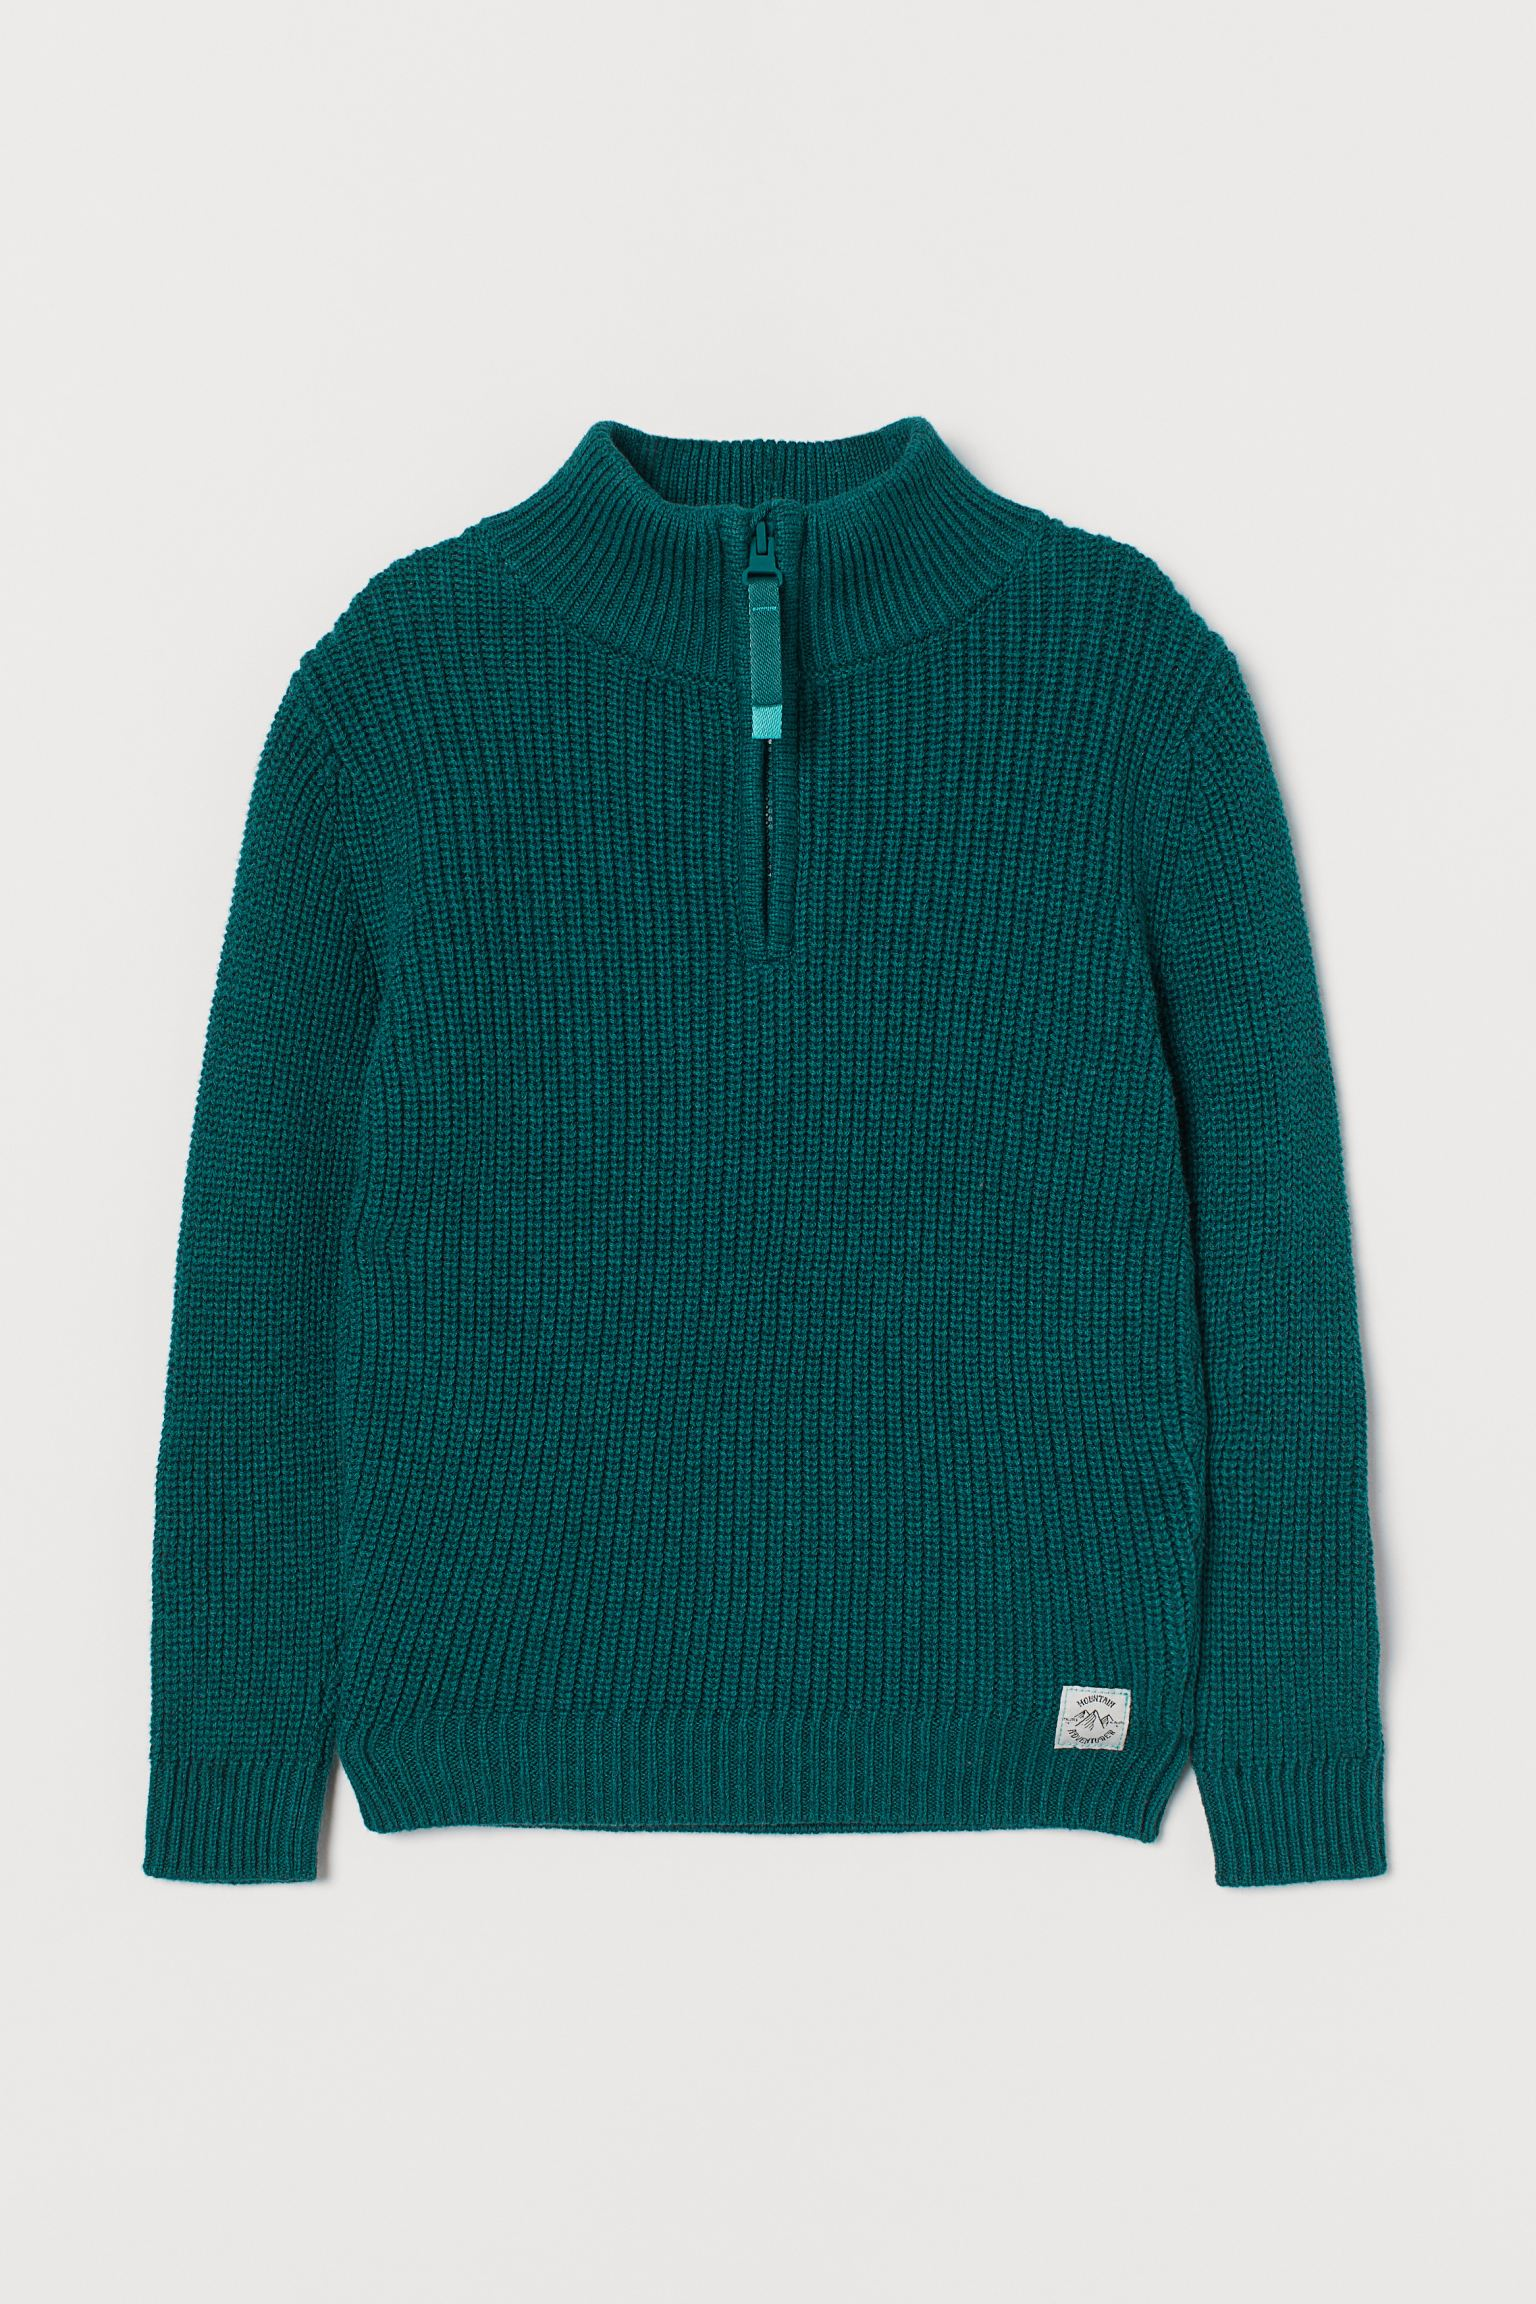 Jersey en canalé de algodón